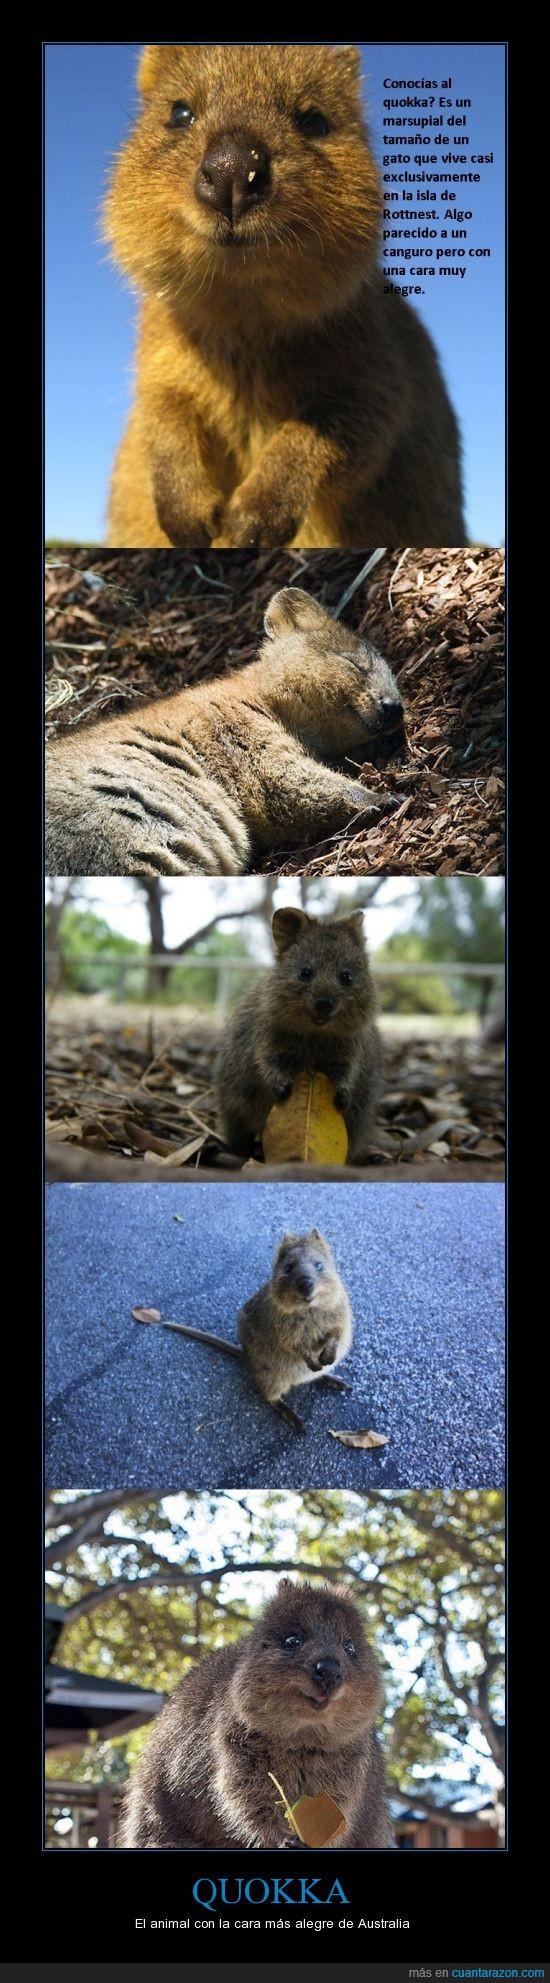 alegría,Australia,marsupial,Quokka,sonrisa